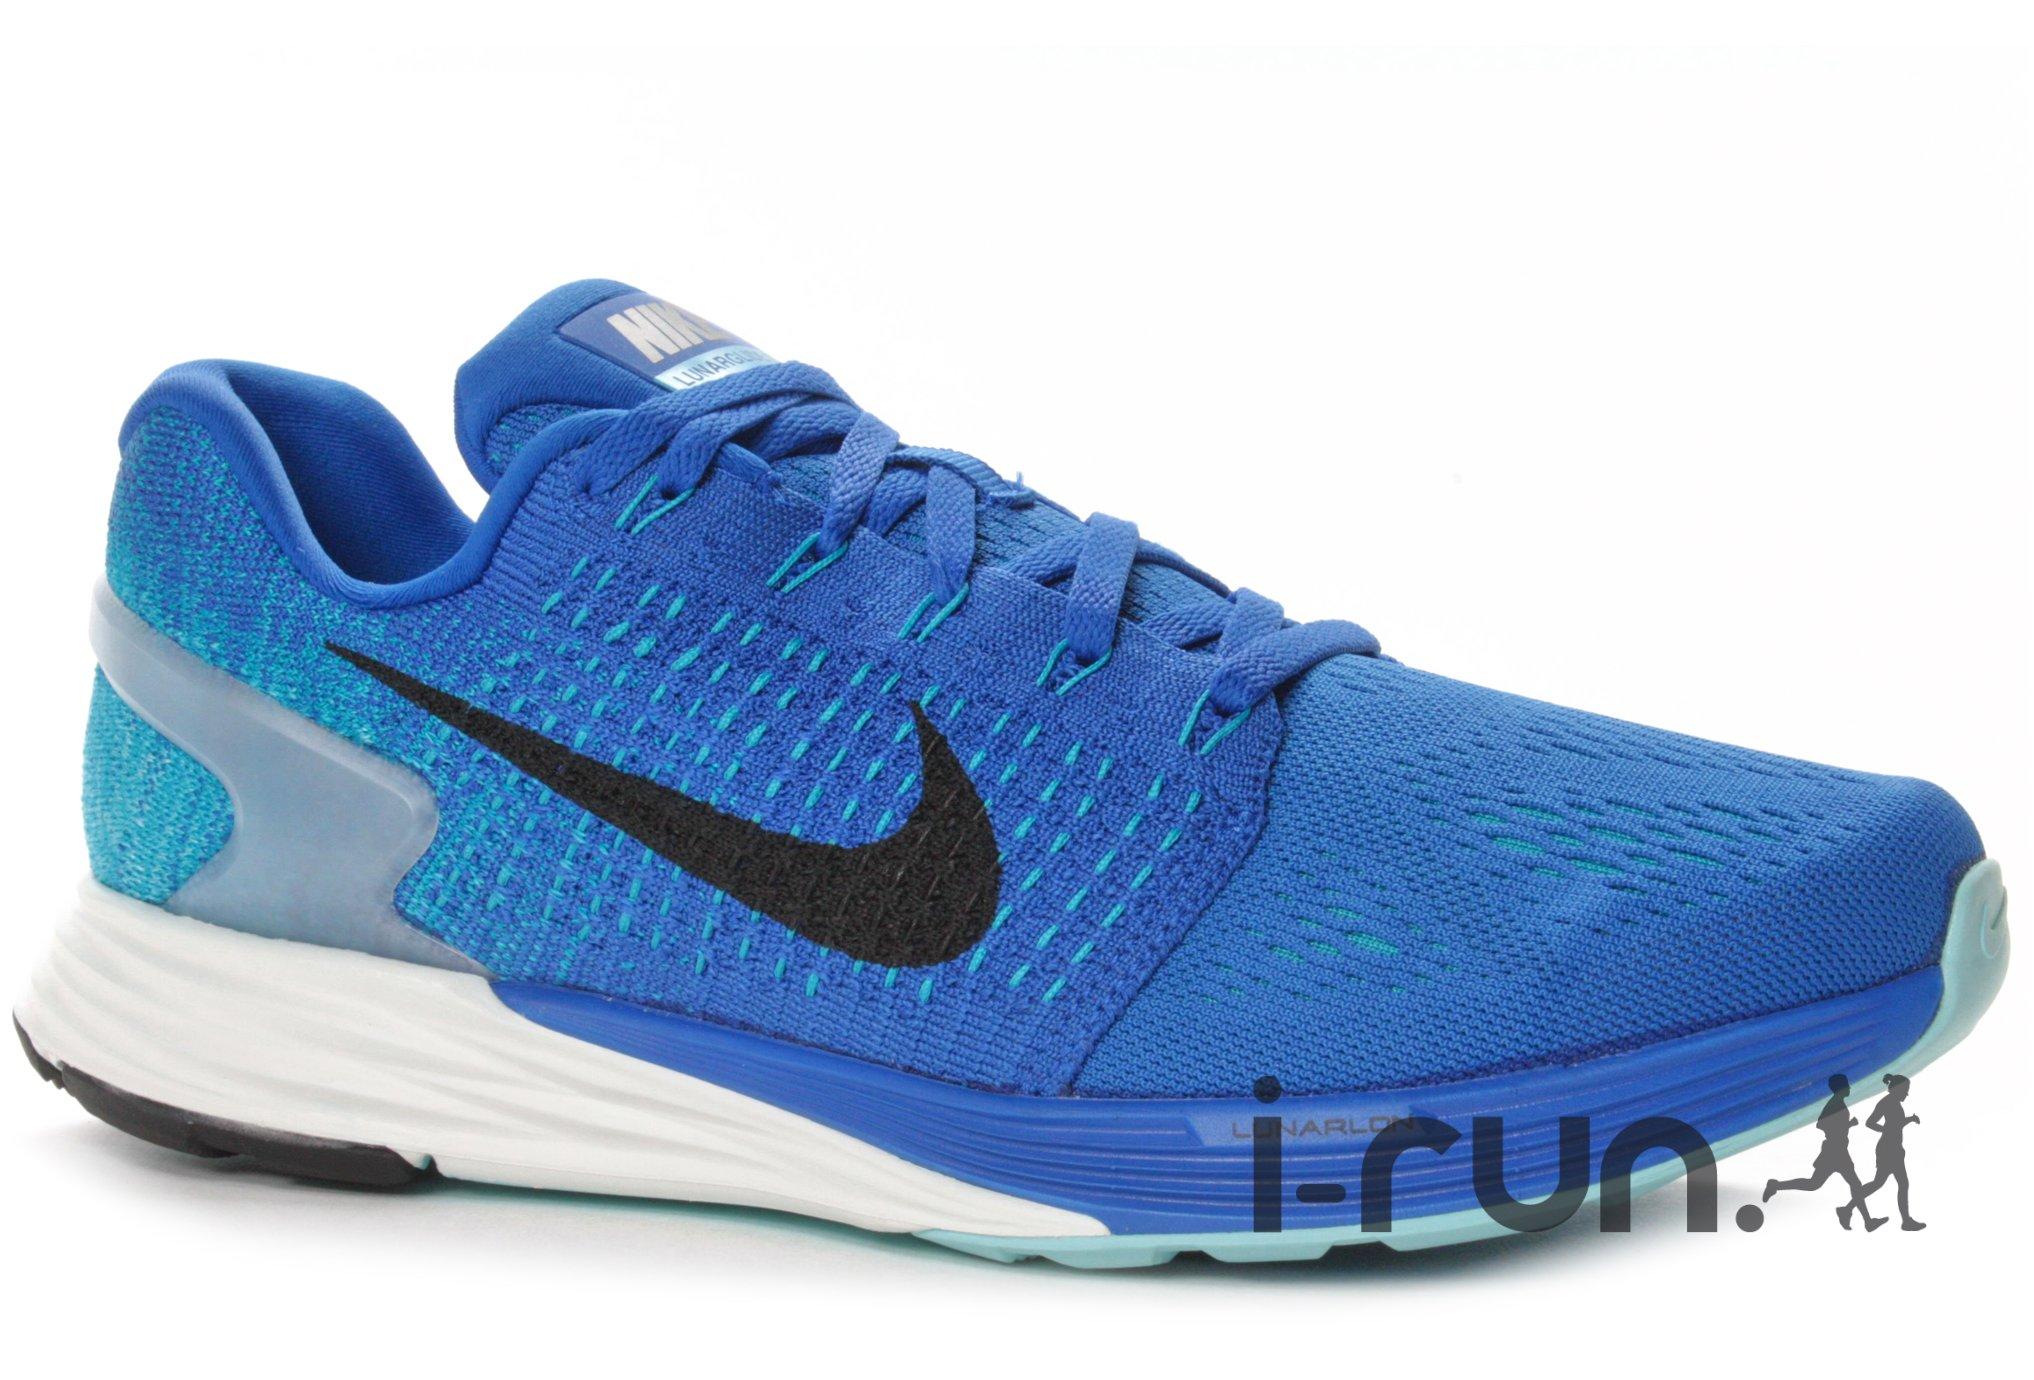 Nike lunarglide 7 m pas cher destockage nike running lunarglide 7 m en promo - Avis destockage fitness ...